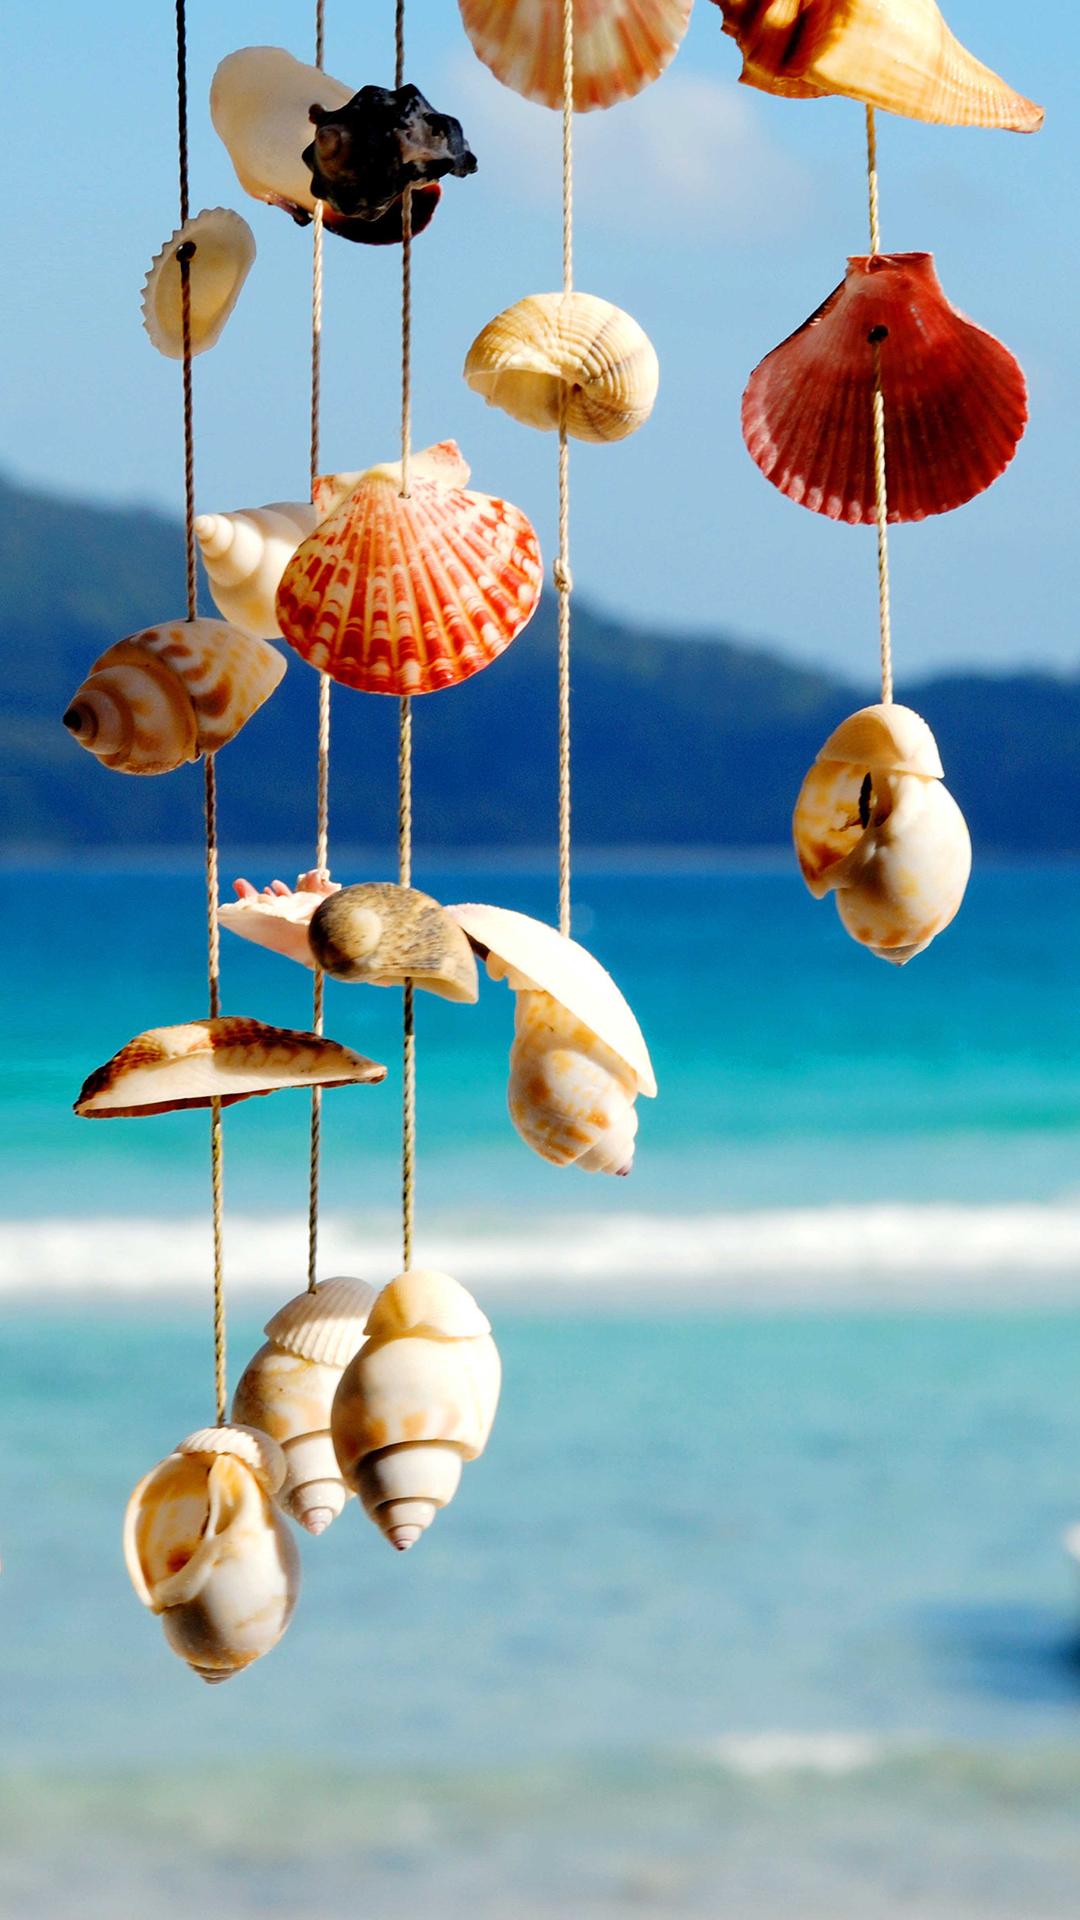 Seaside clipart summer wallpaper #14